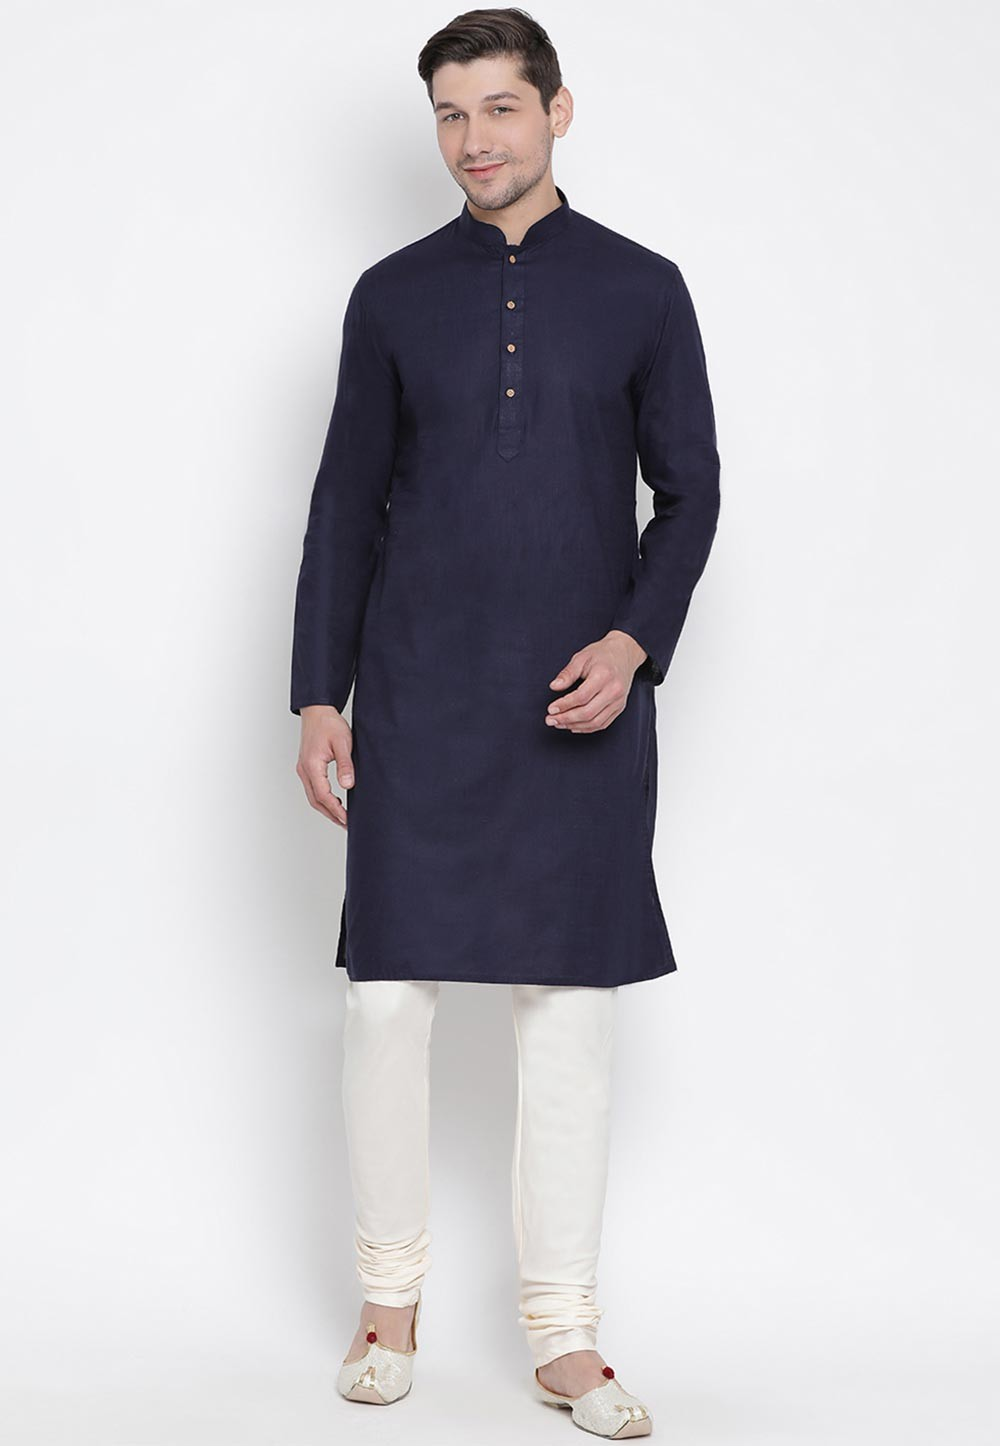 Navy Blue Colour Men's Kurta Pyjama.